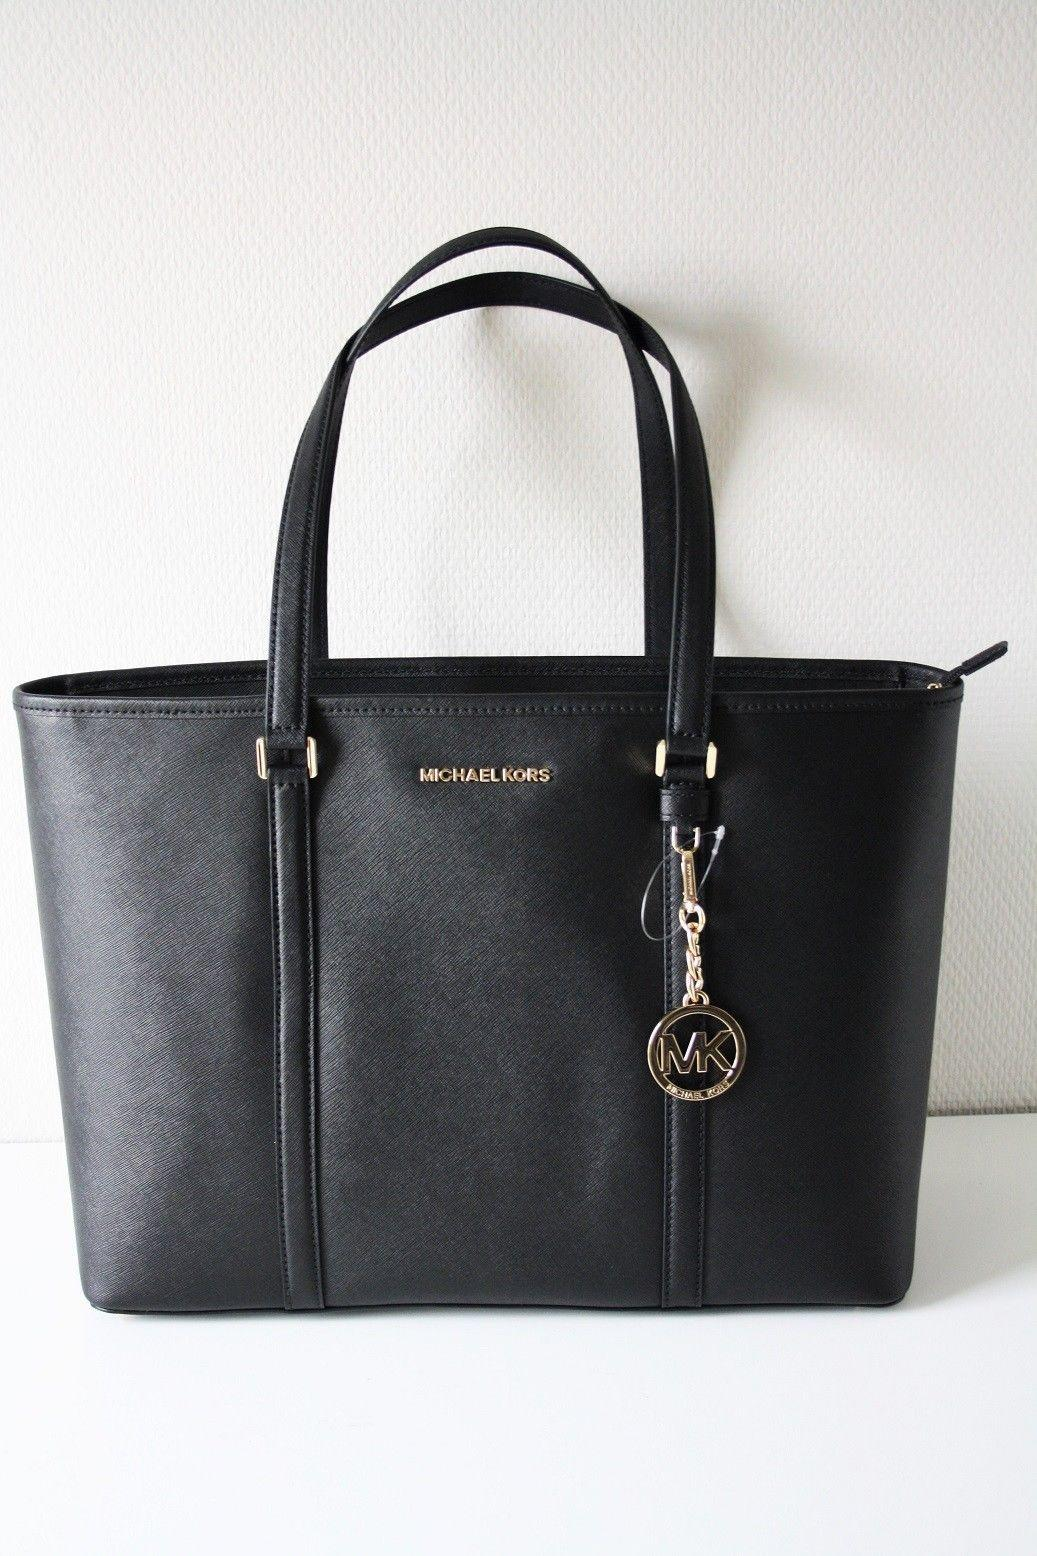 e2f50bc44c38ef Singapore. Authentic Michael Kors Sady Large Tote Saffiano Leather Tote/ Shoulder  Bag #35T7GD4T7L